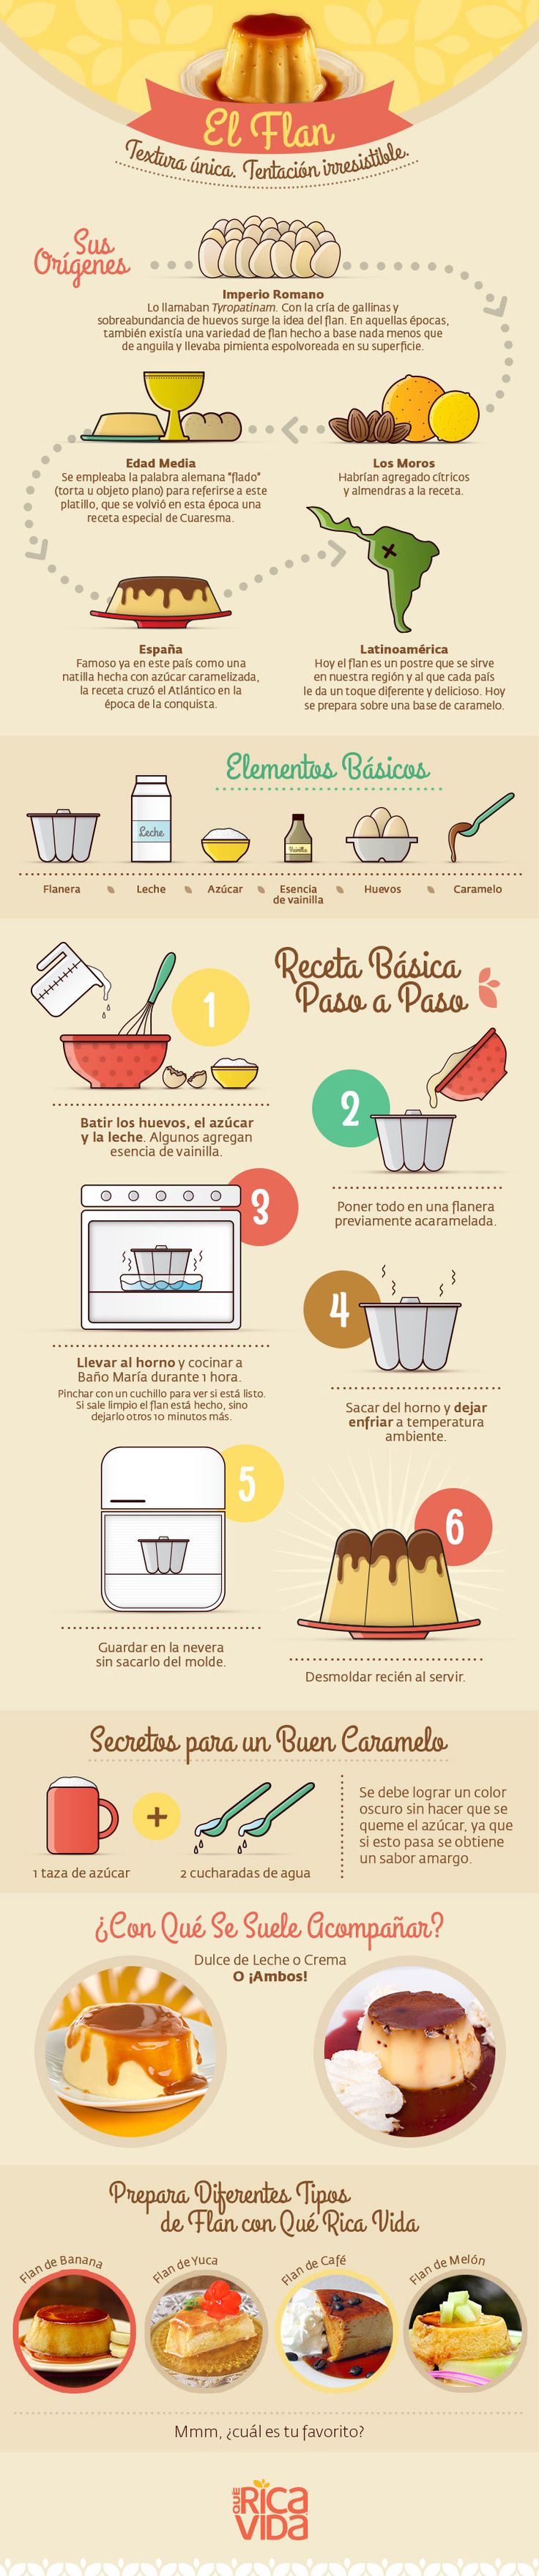 "Una Delicia ""Flan-tástica"" #infographic #flan #spanish"